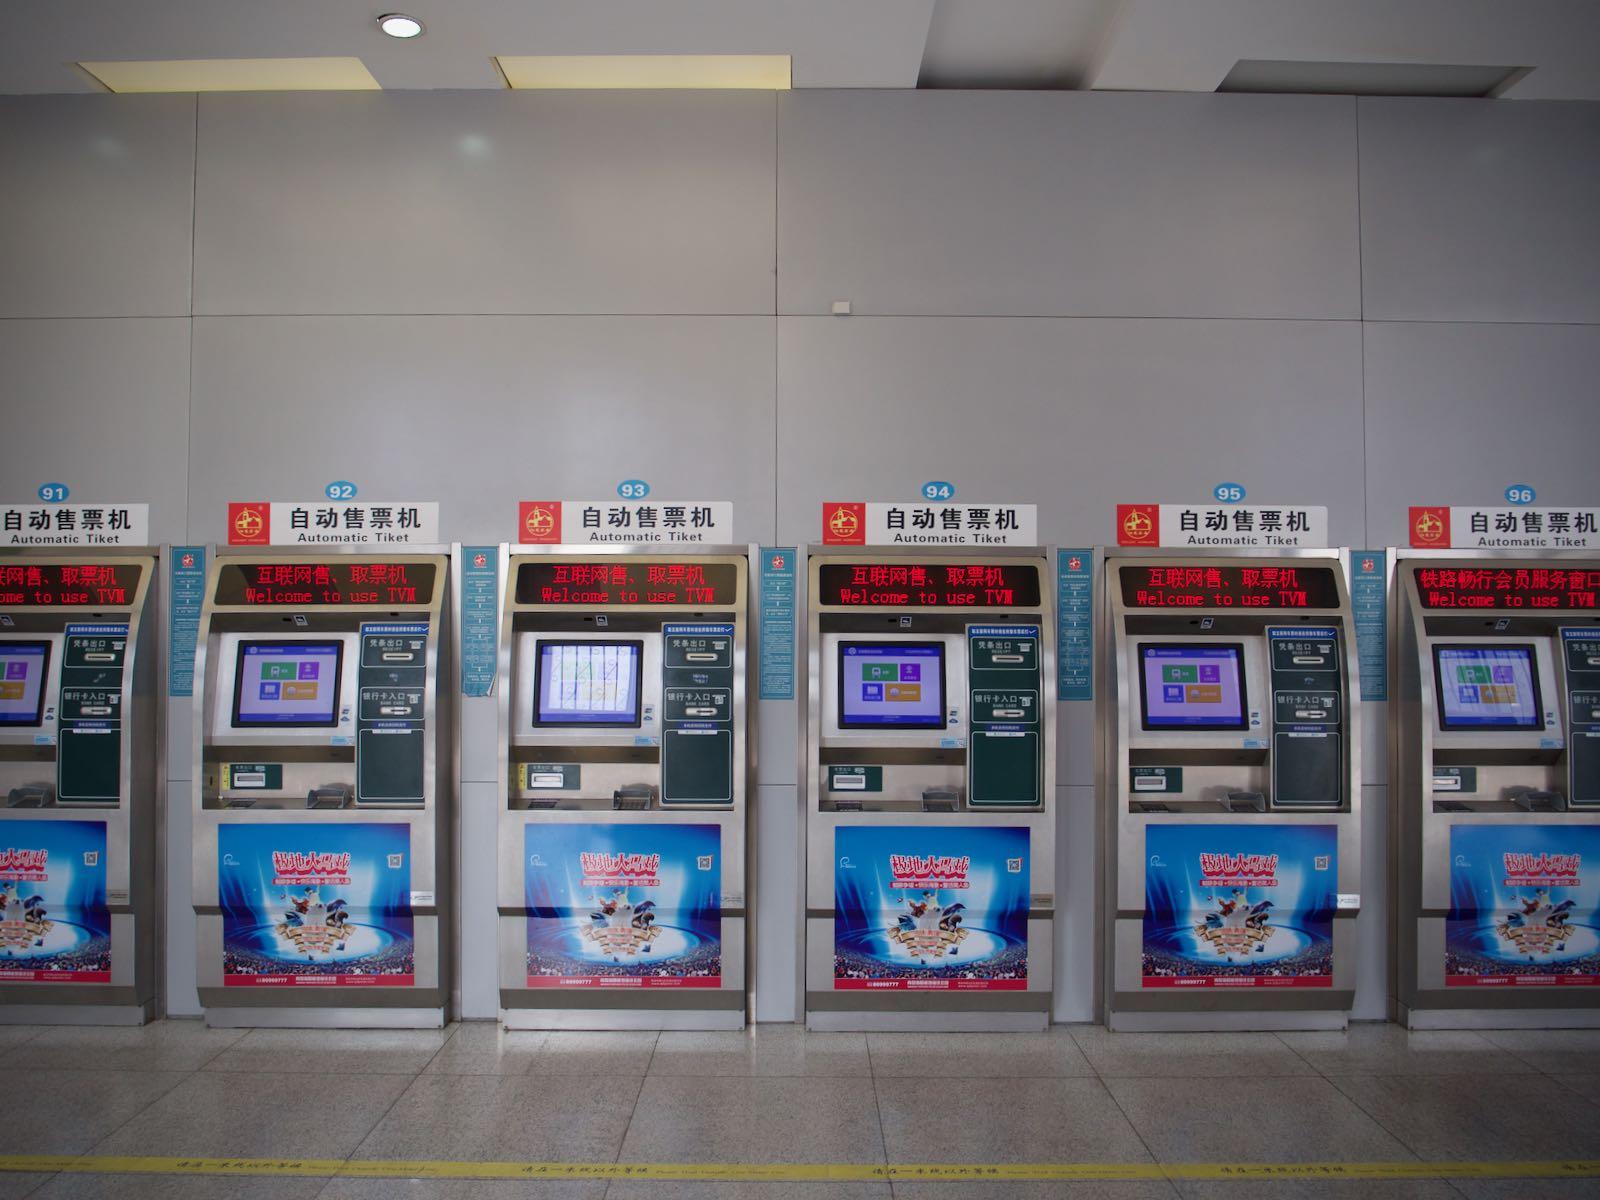 青島駅舎の一部 DMC-GX8 + LEICA DG 12-60mm